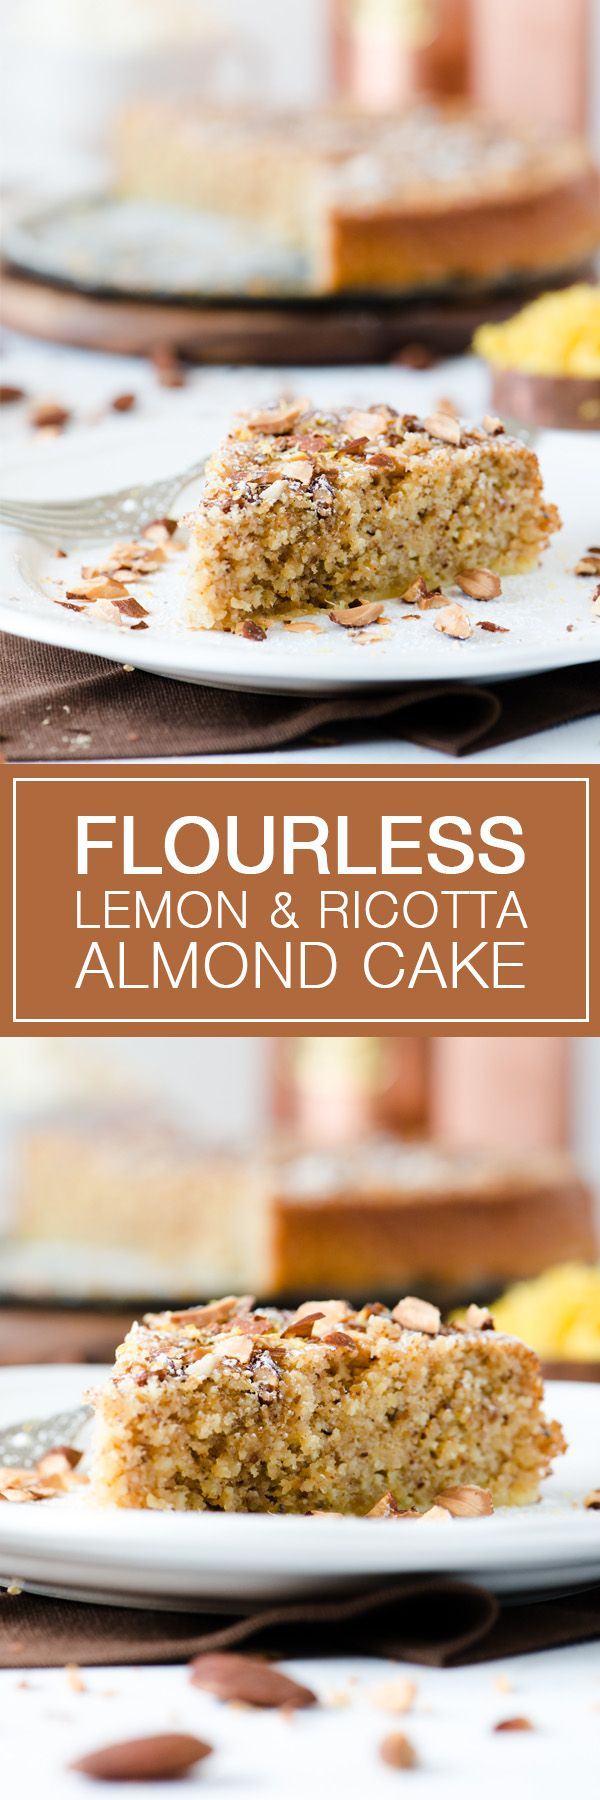 Flourless Lemon & Ricotta Almond Cake - Great alternative to a ...